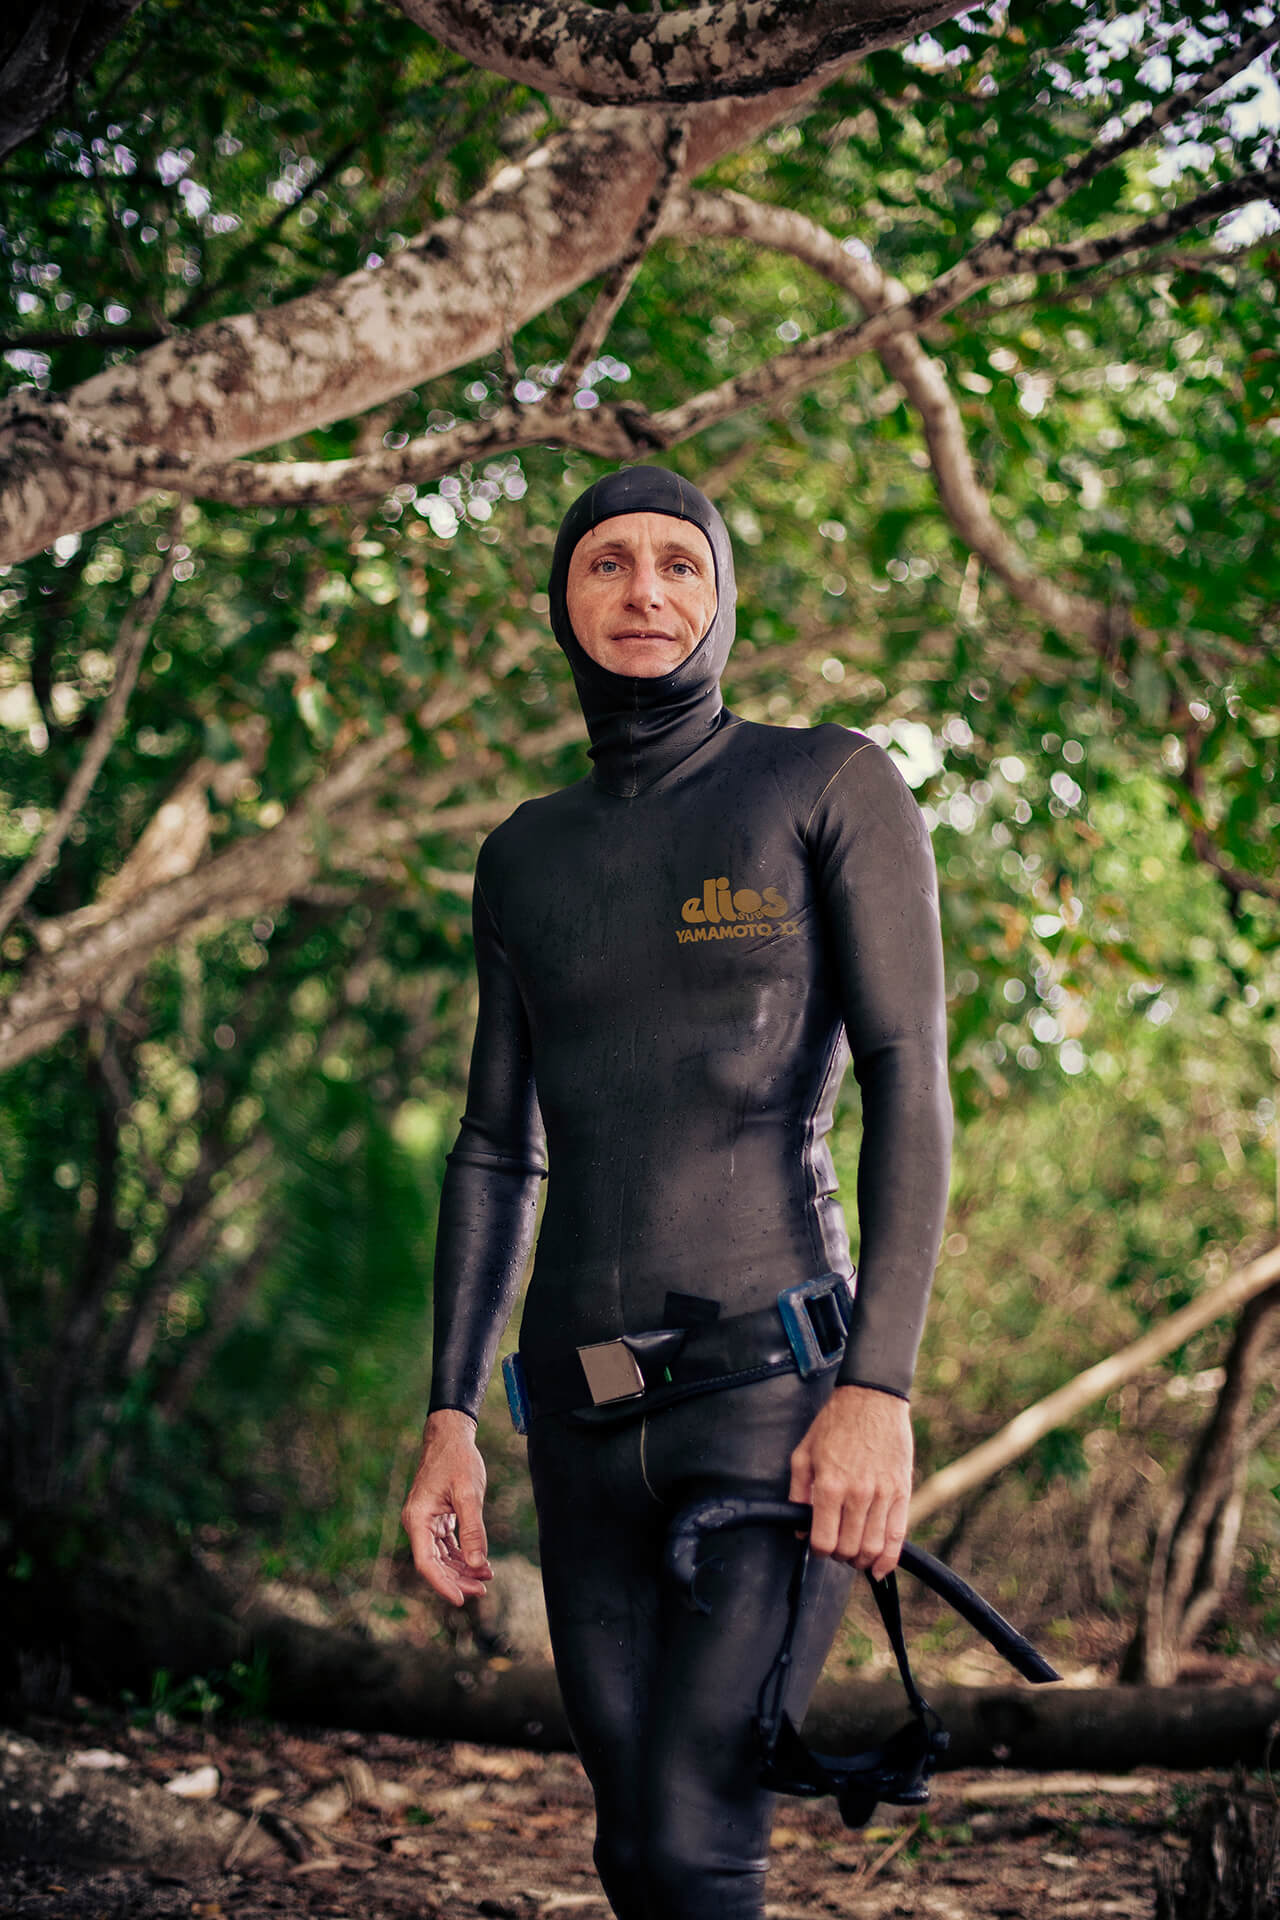 Austrian freediver, Wolfgang Dafert.